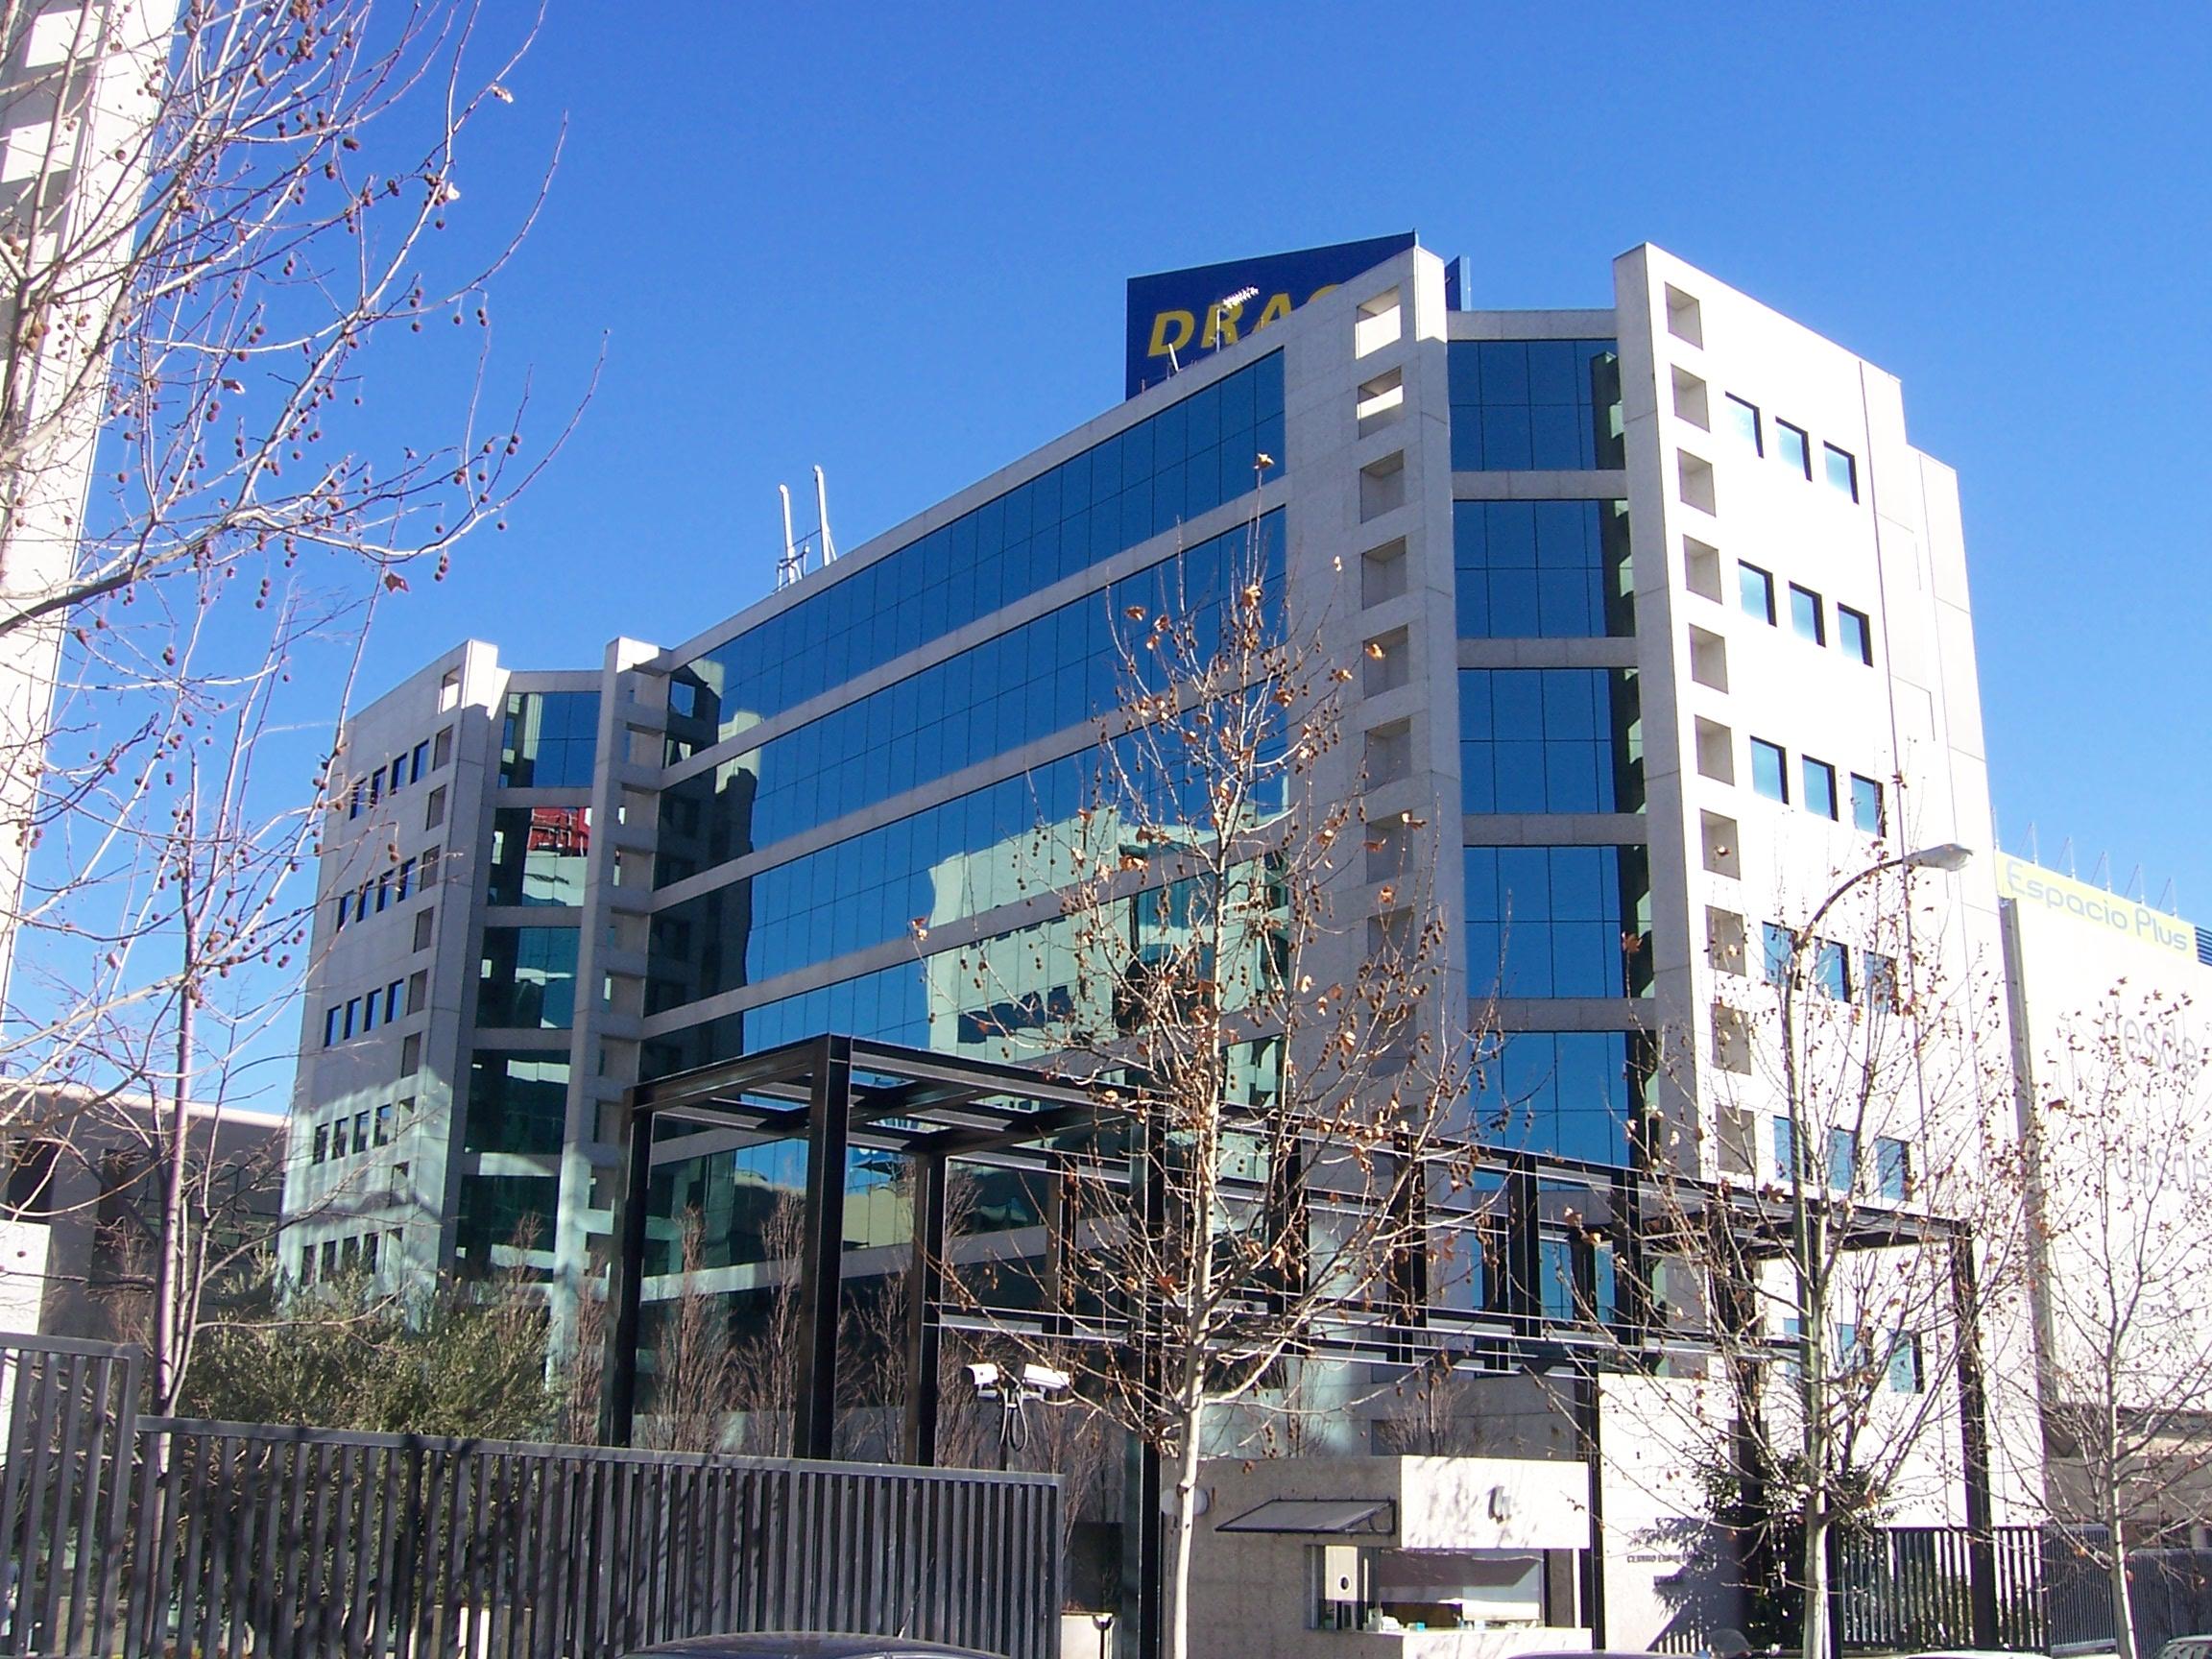 Bnp paribas real estate idealista news - Idealista oficinas madrid ...